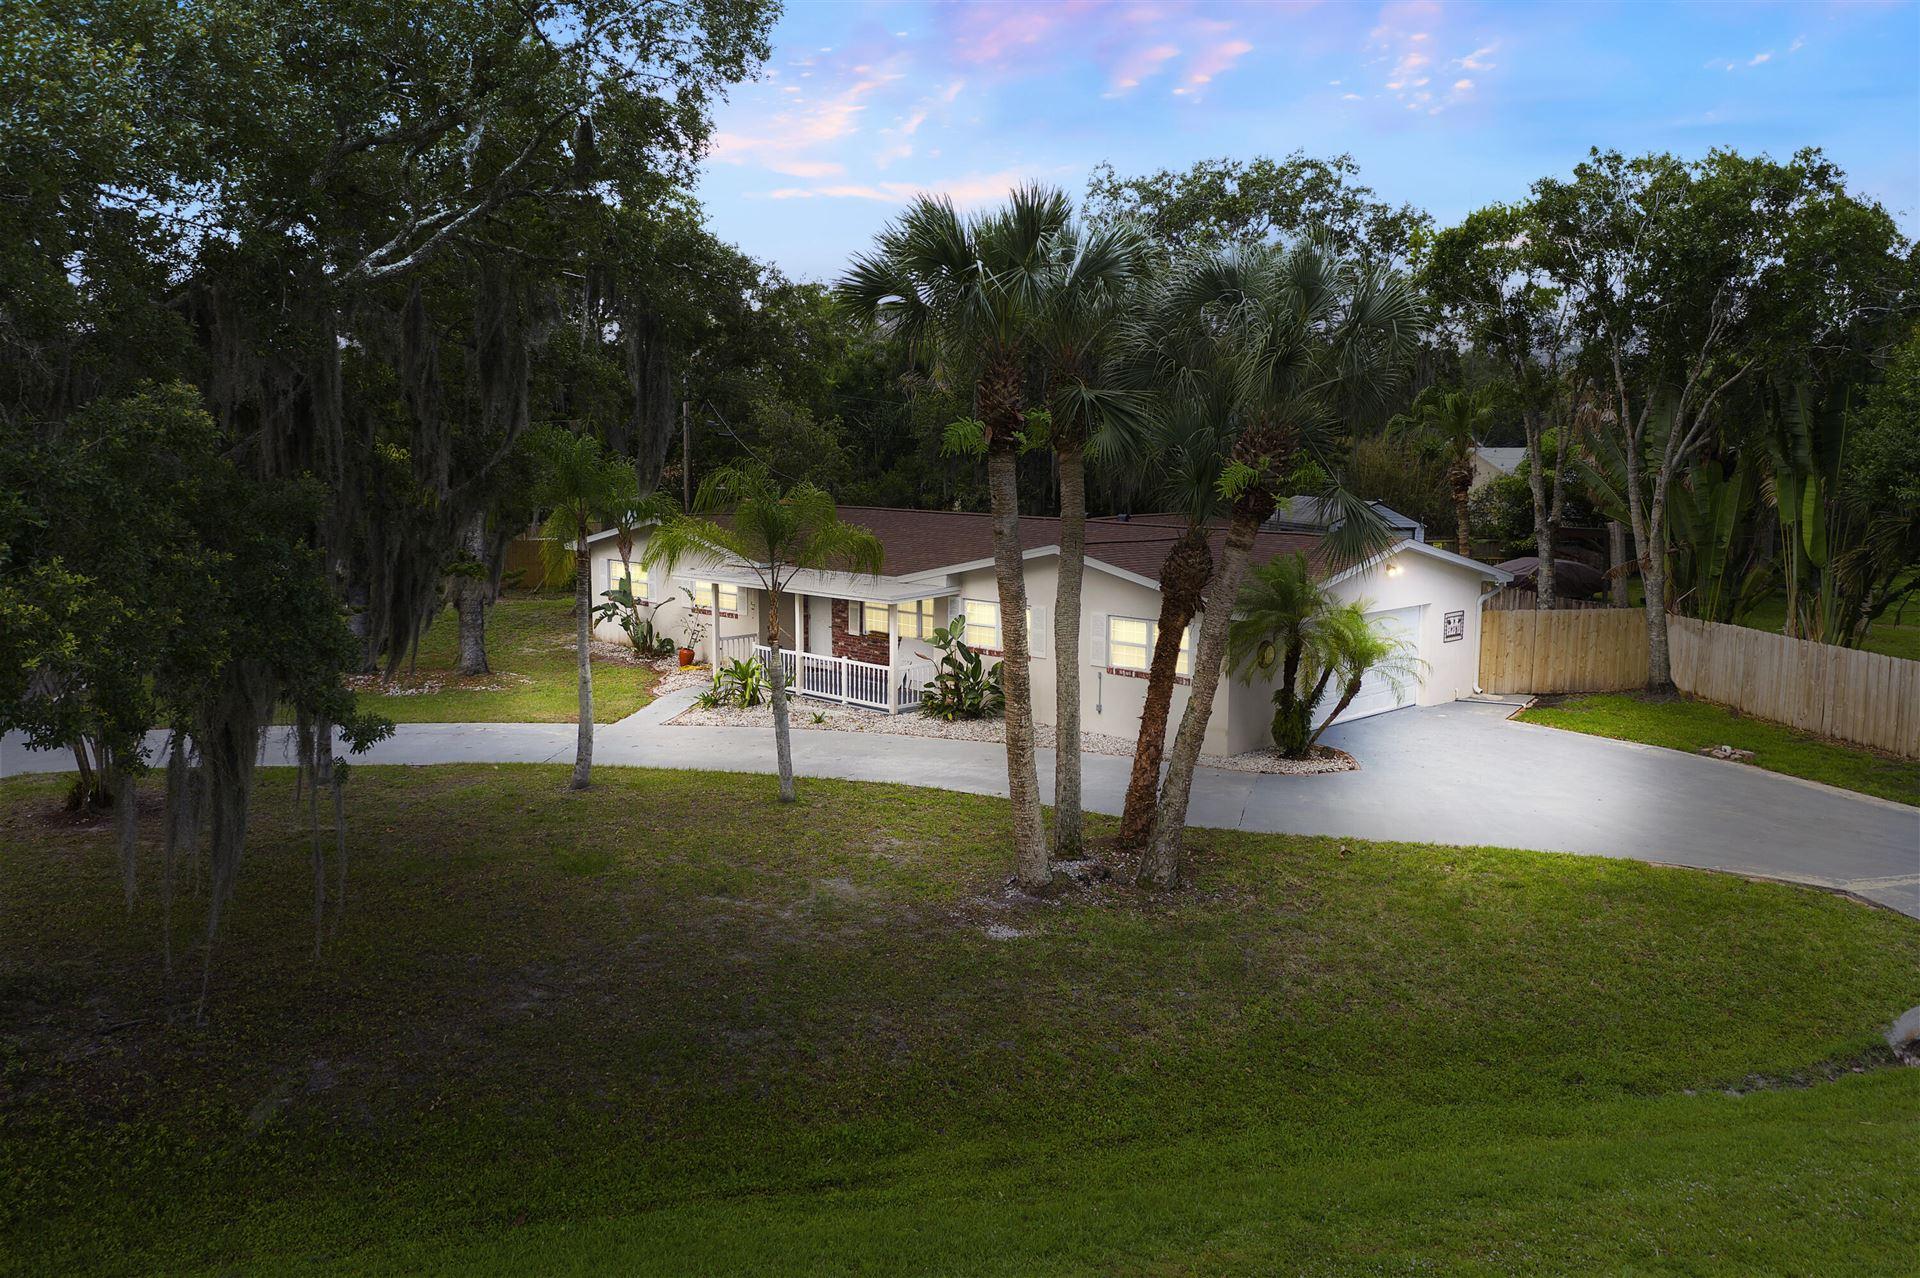 8101 Coquina Avenue, Fort Pierce, FL 34951 - MLS#: RX-10716396